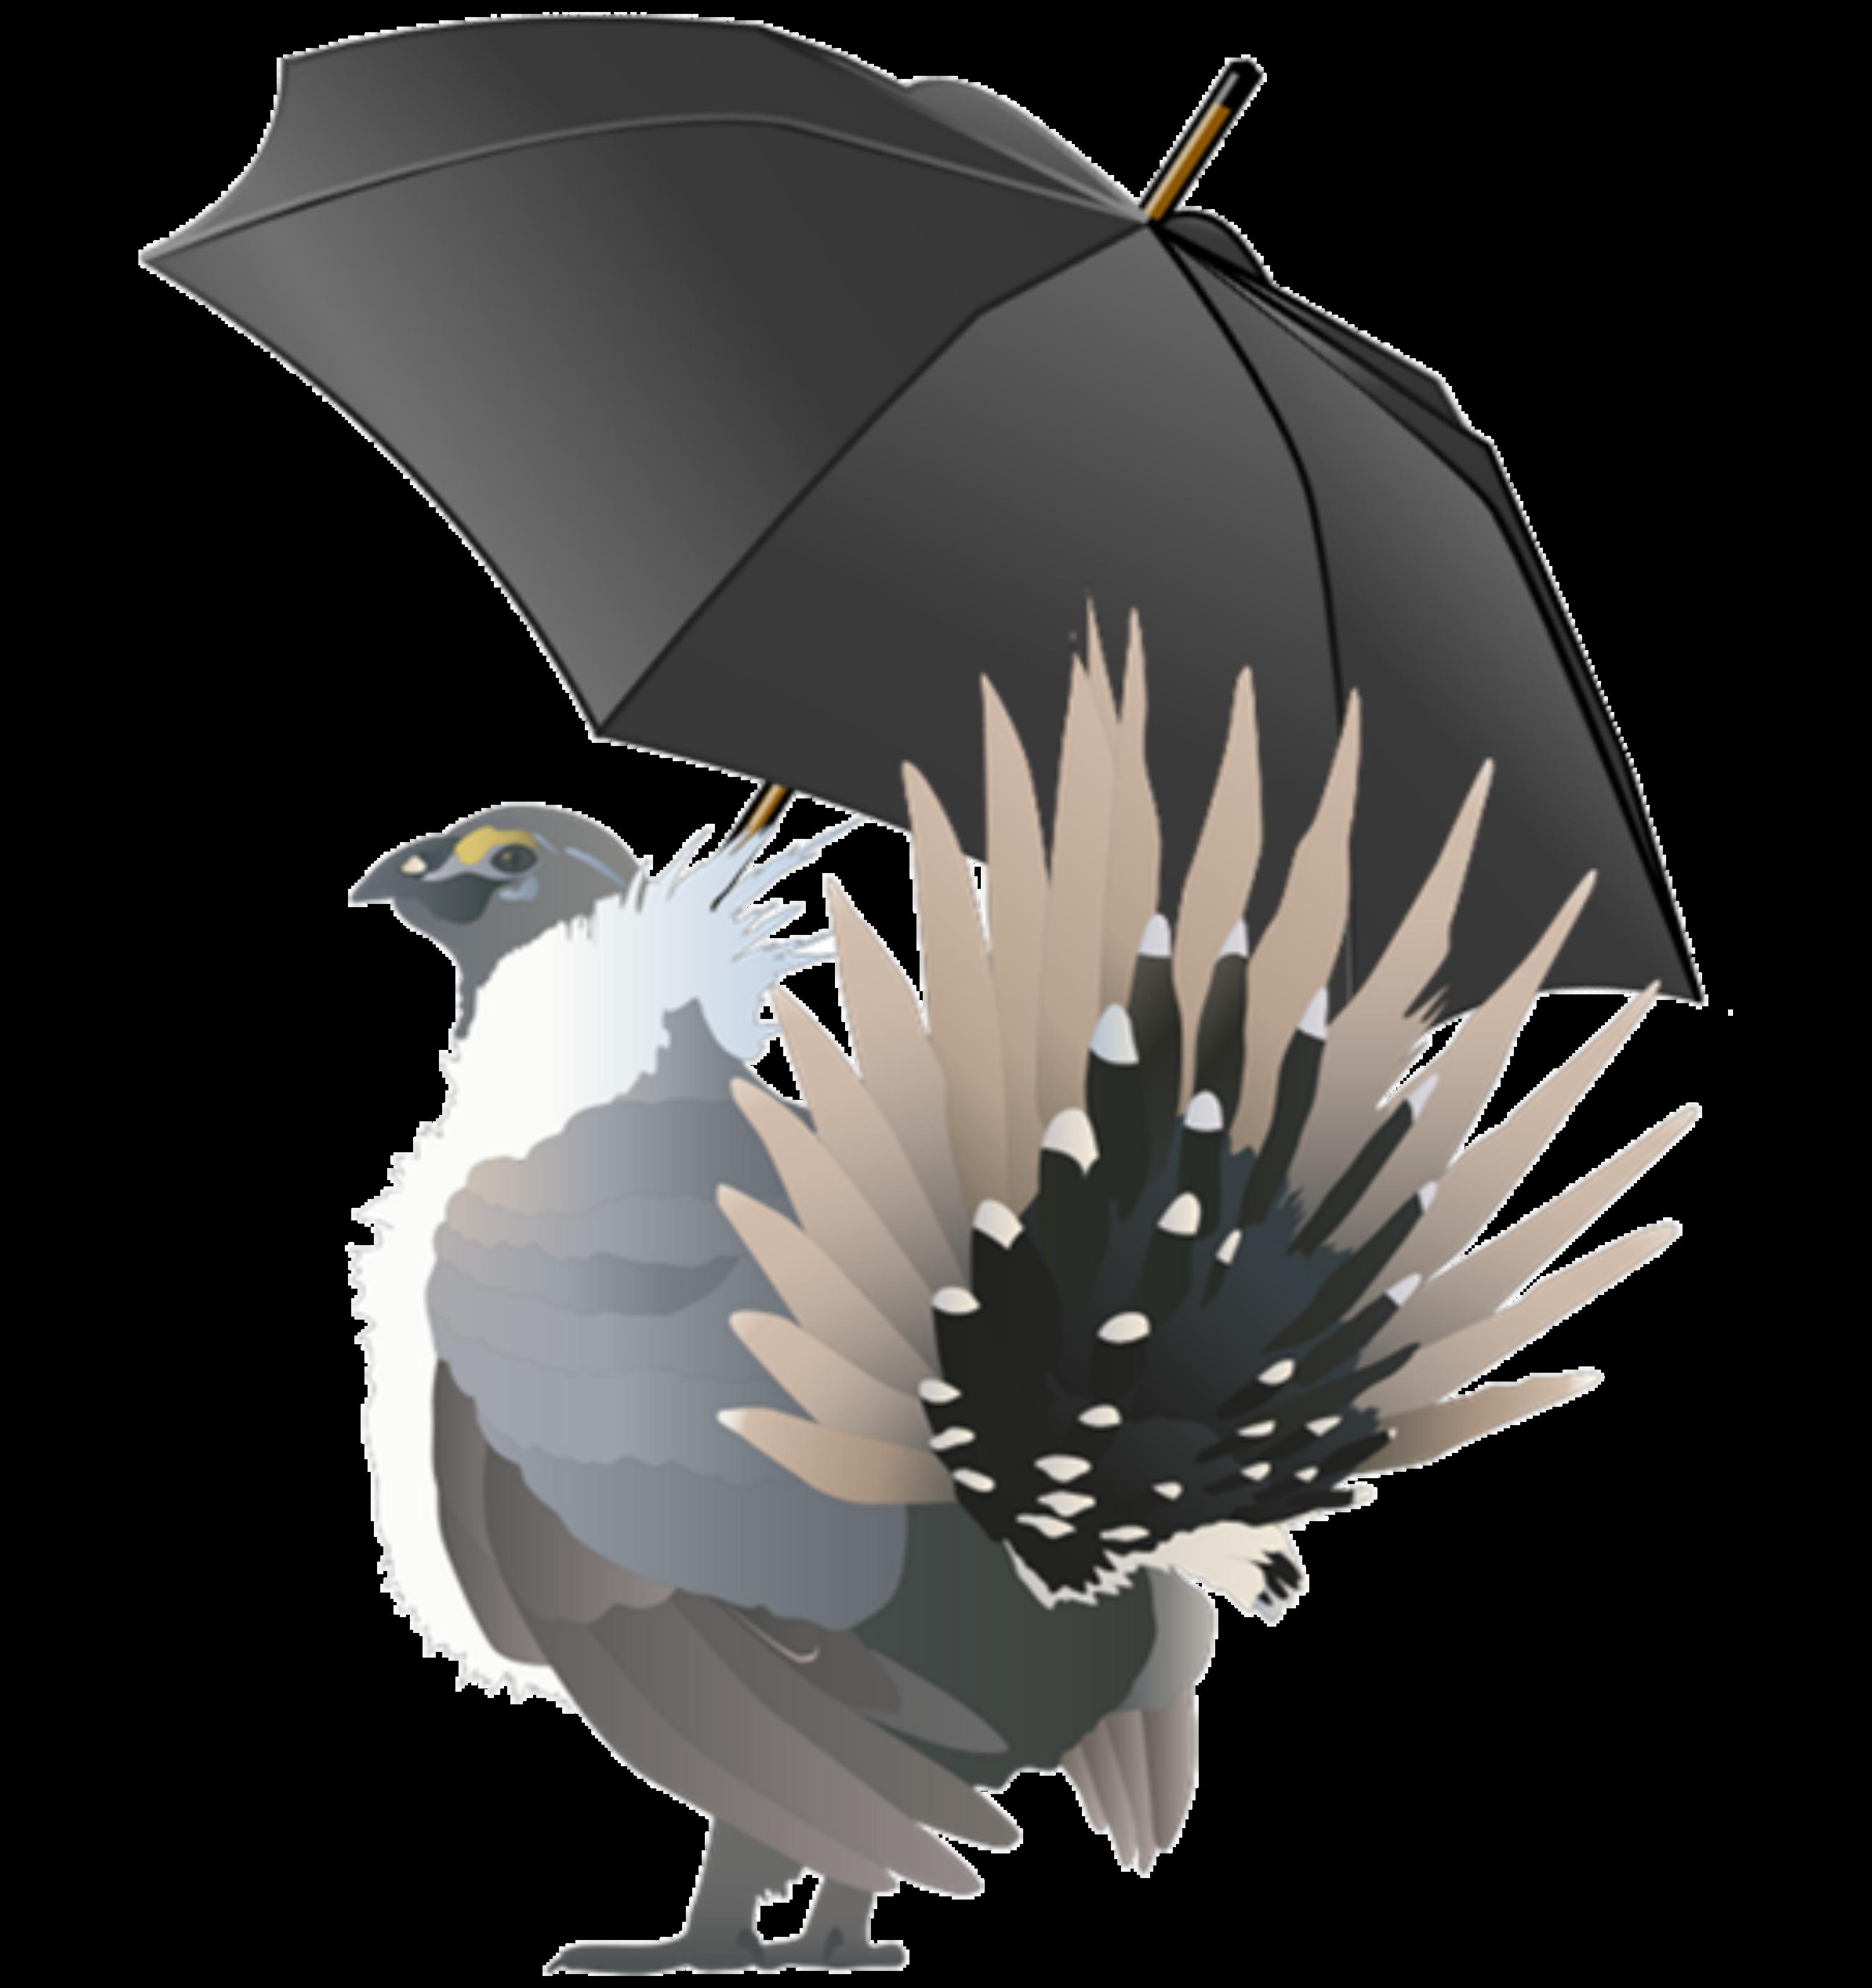 sage-grouse umbrella